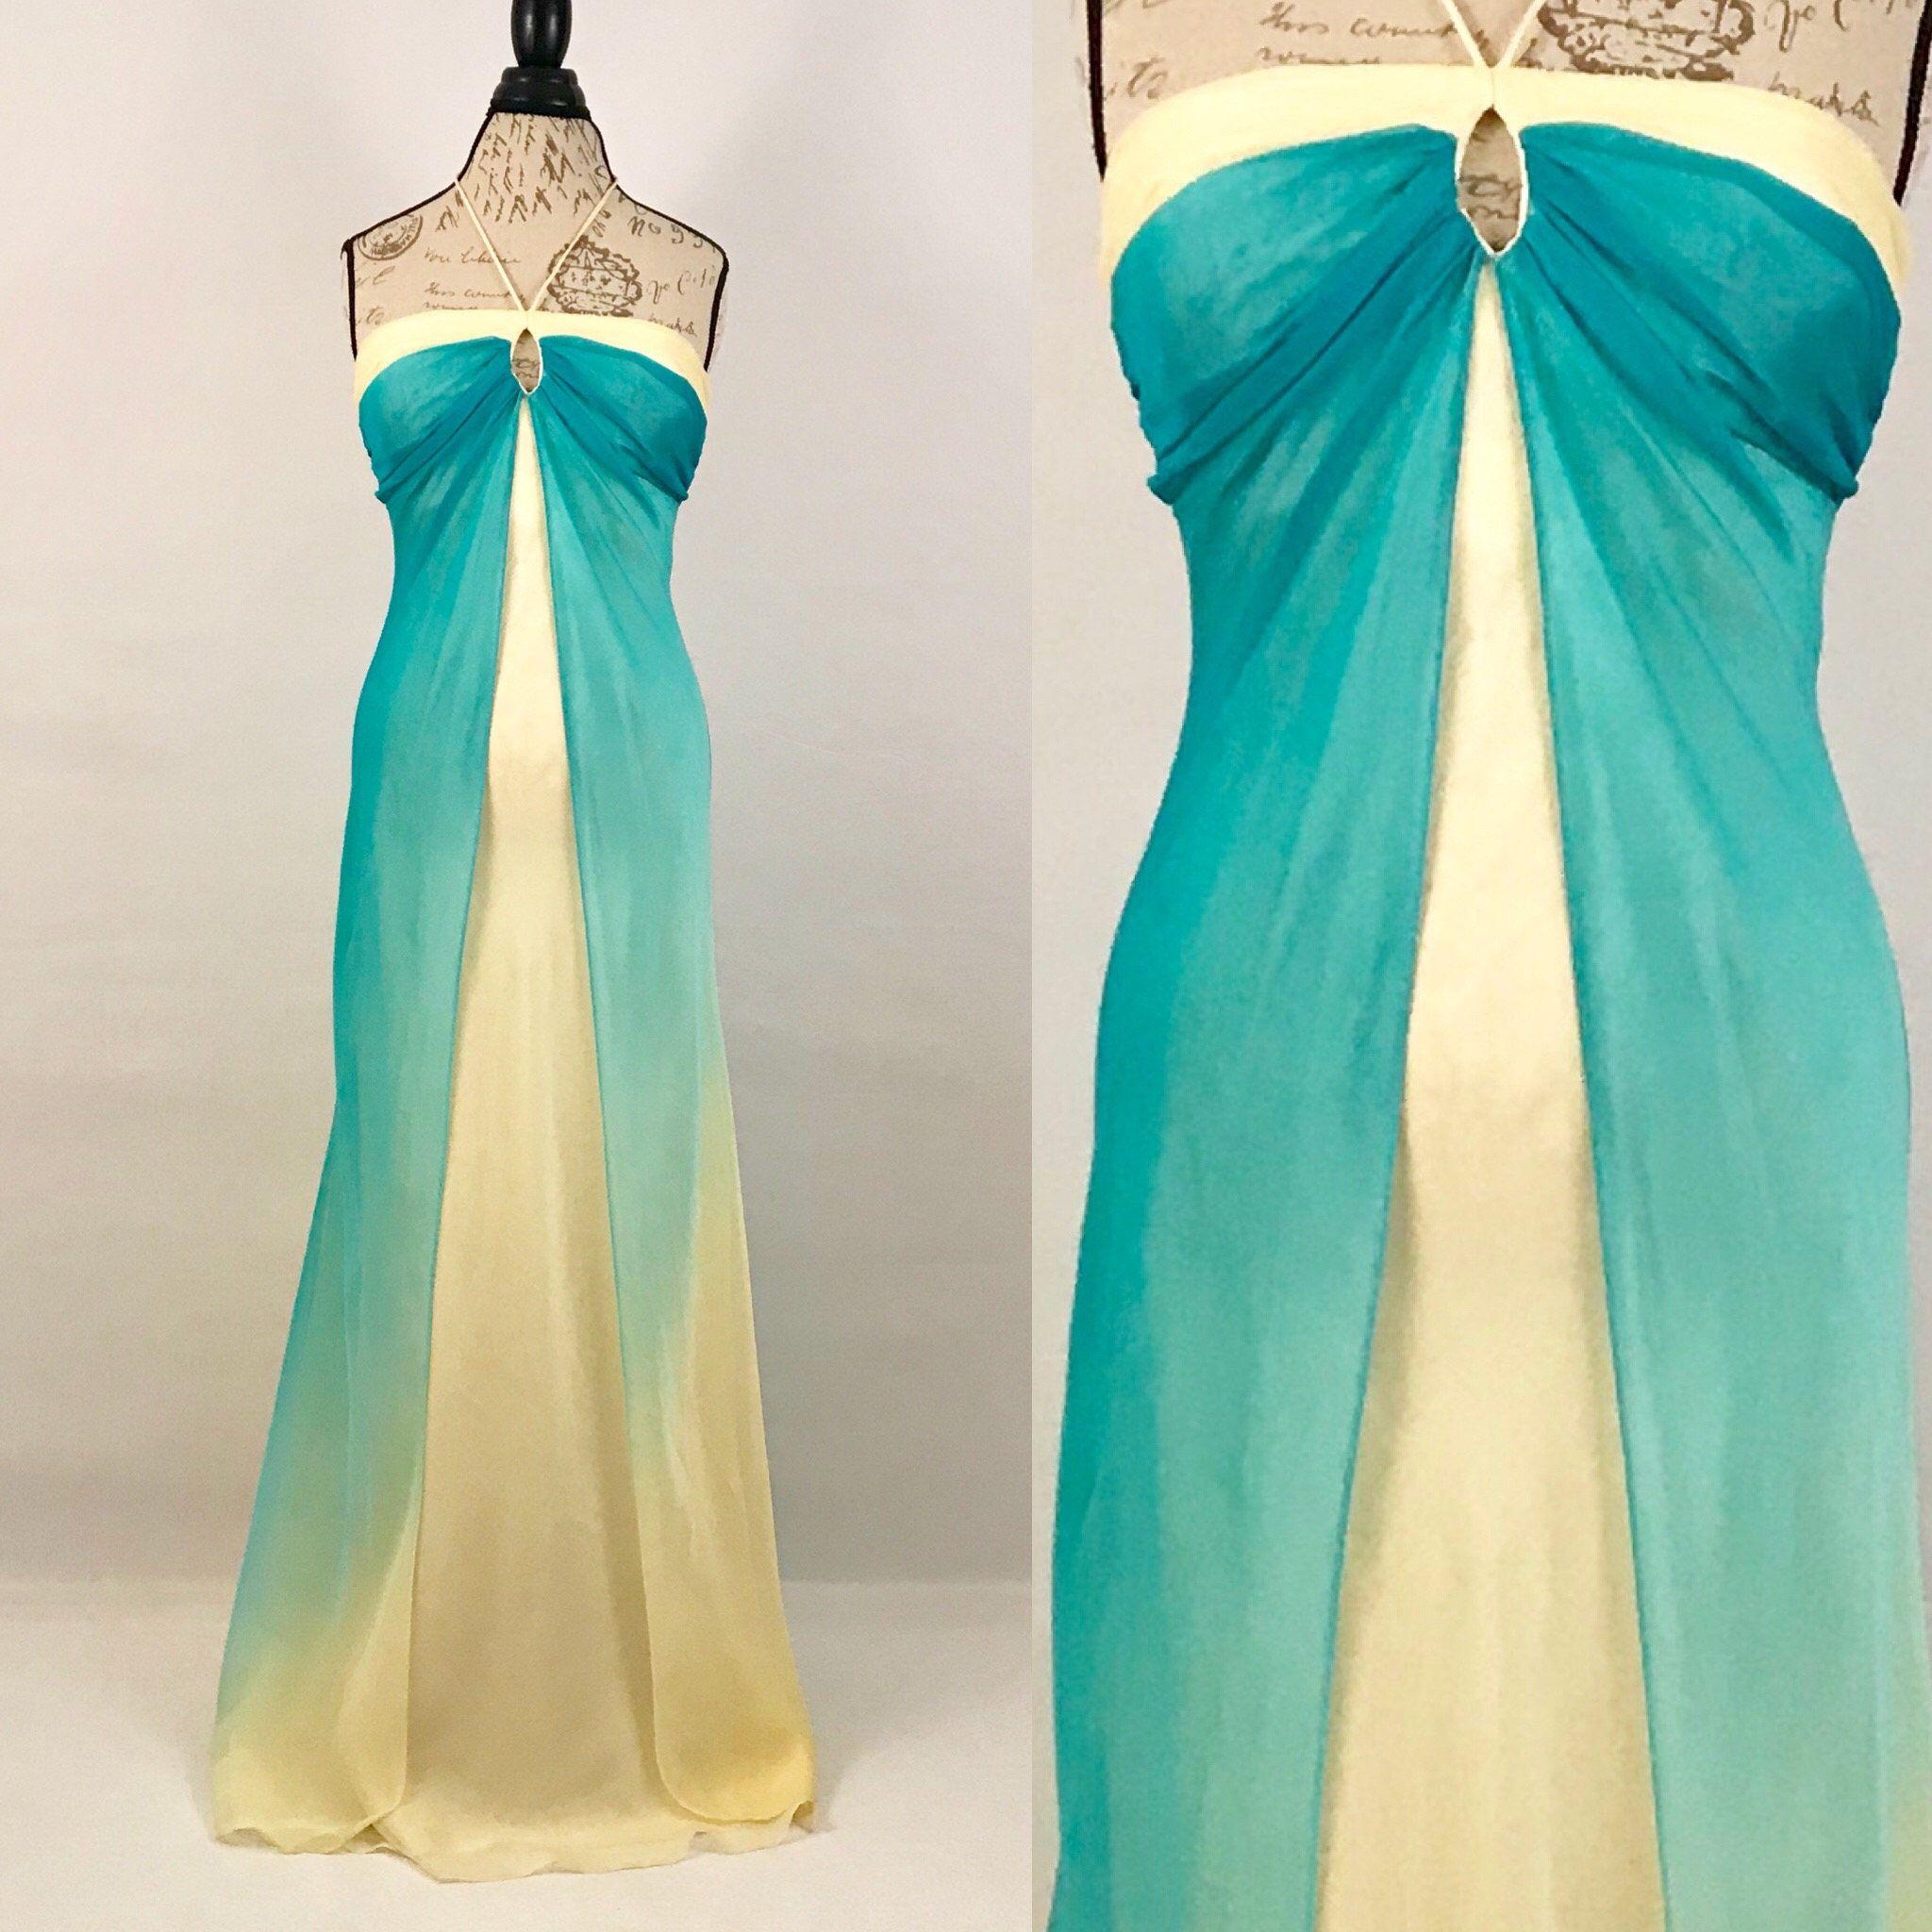 1990s Chiffon Ombre Prom Dress Vintage Yellow Blue Hues Etsy Prom Dresses Vintage Vintage Dresses Ombre Prom Dresses [ 2048 x 2048 Pixel ]